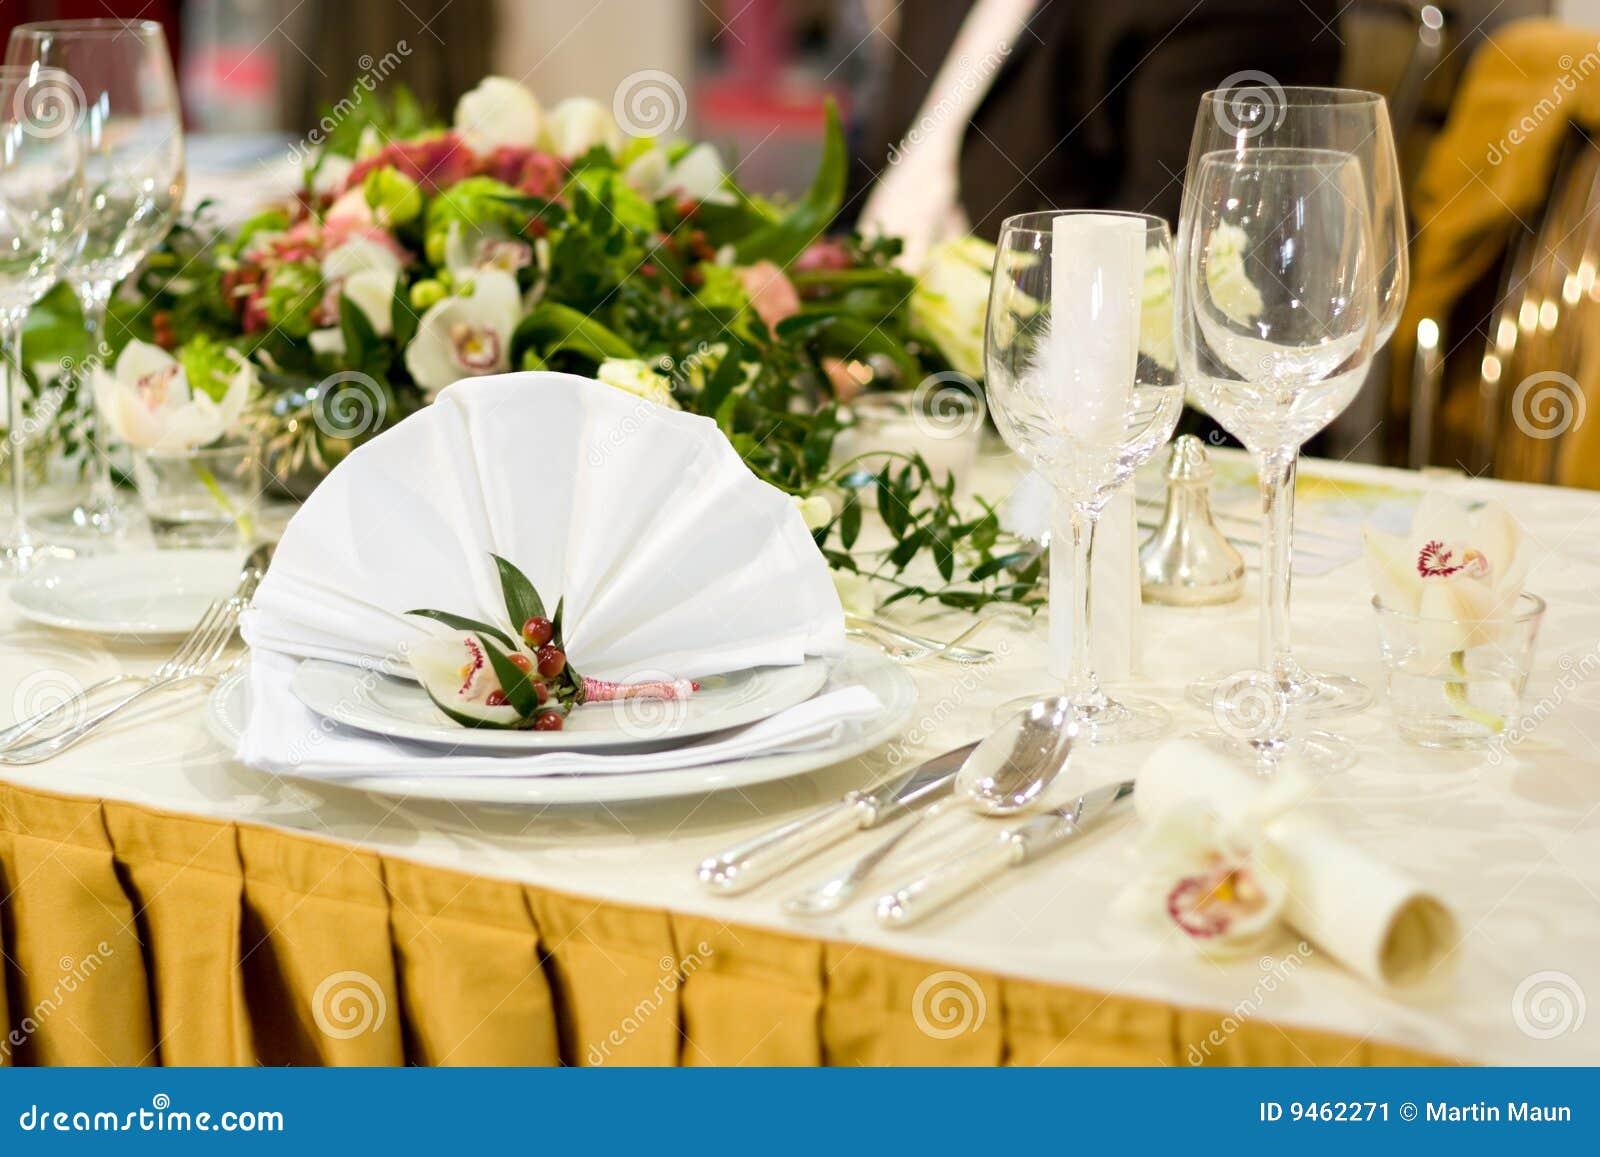 Luxurious Wedding Table Setting Stock Image - Image of setting ...